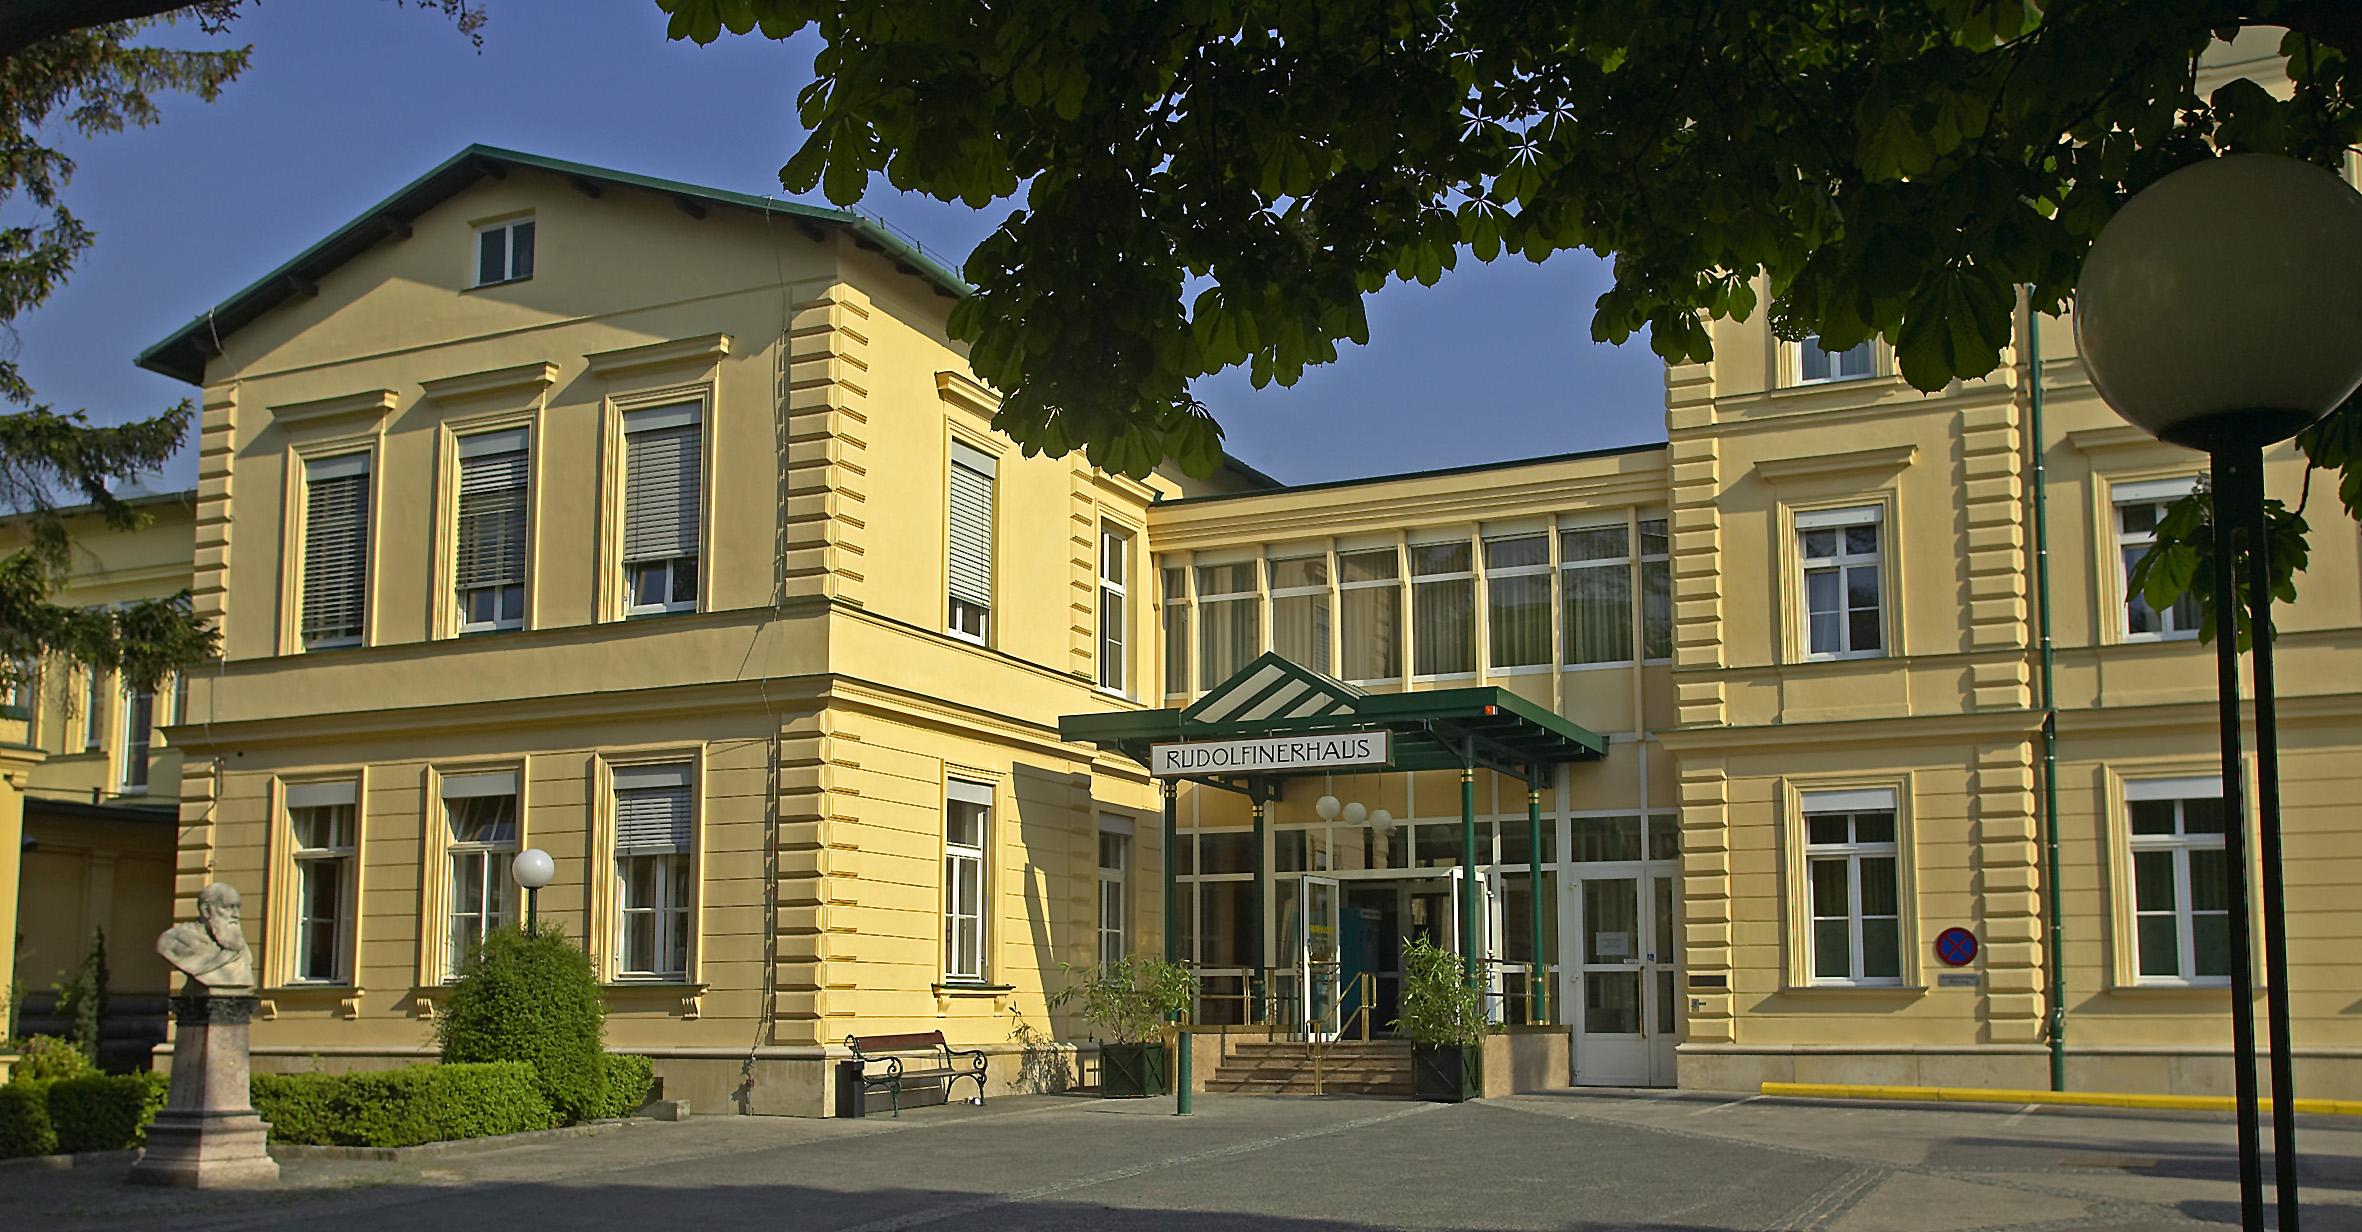 Rudolfiner Haus02.jpg